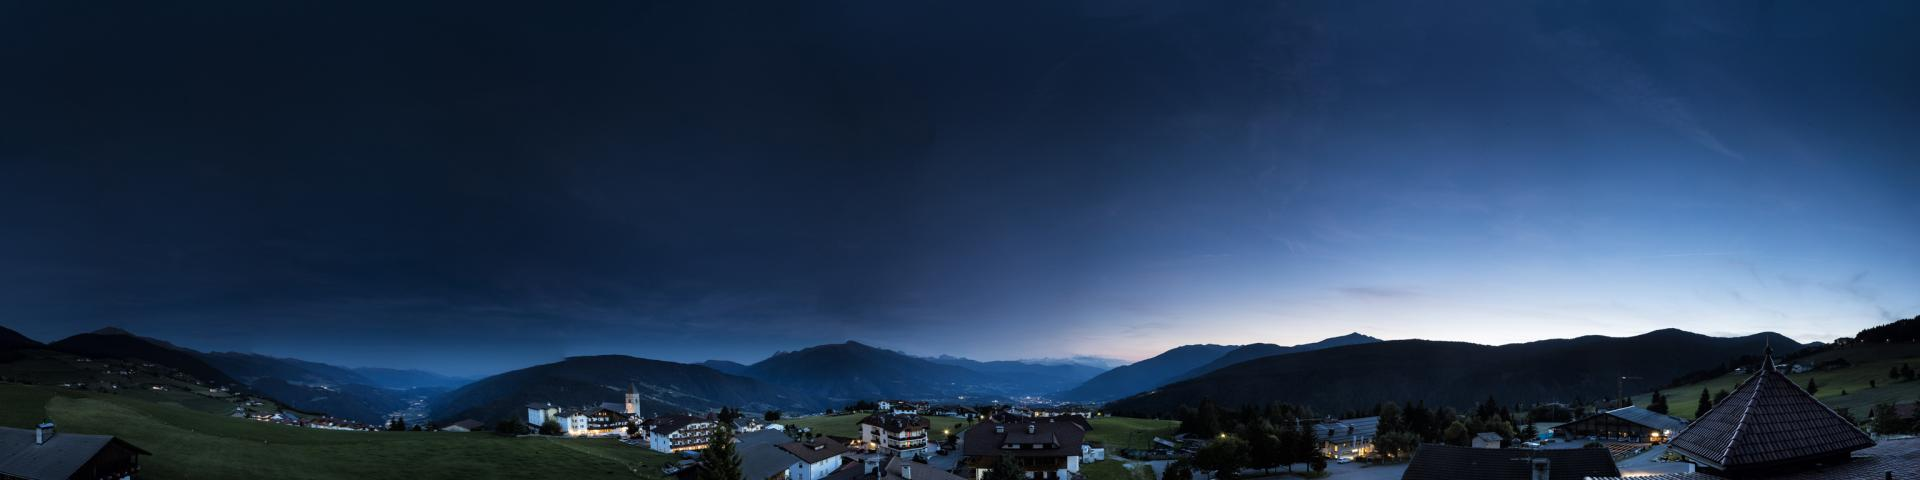 panorama_nacht.jpg